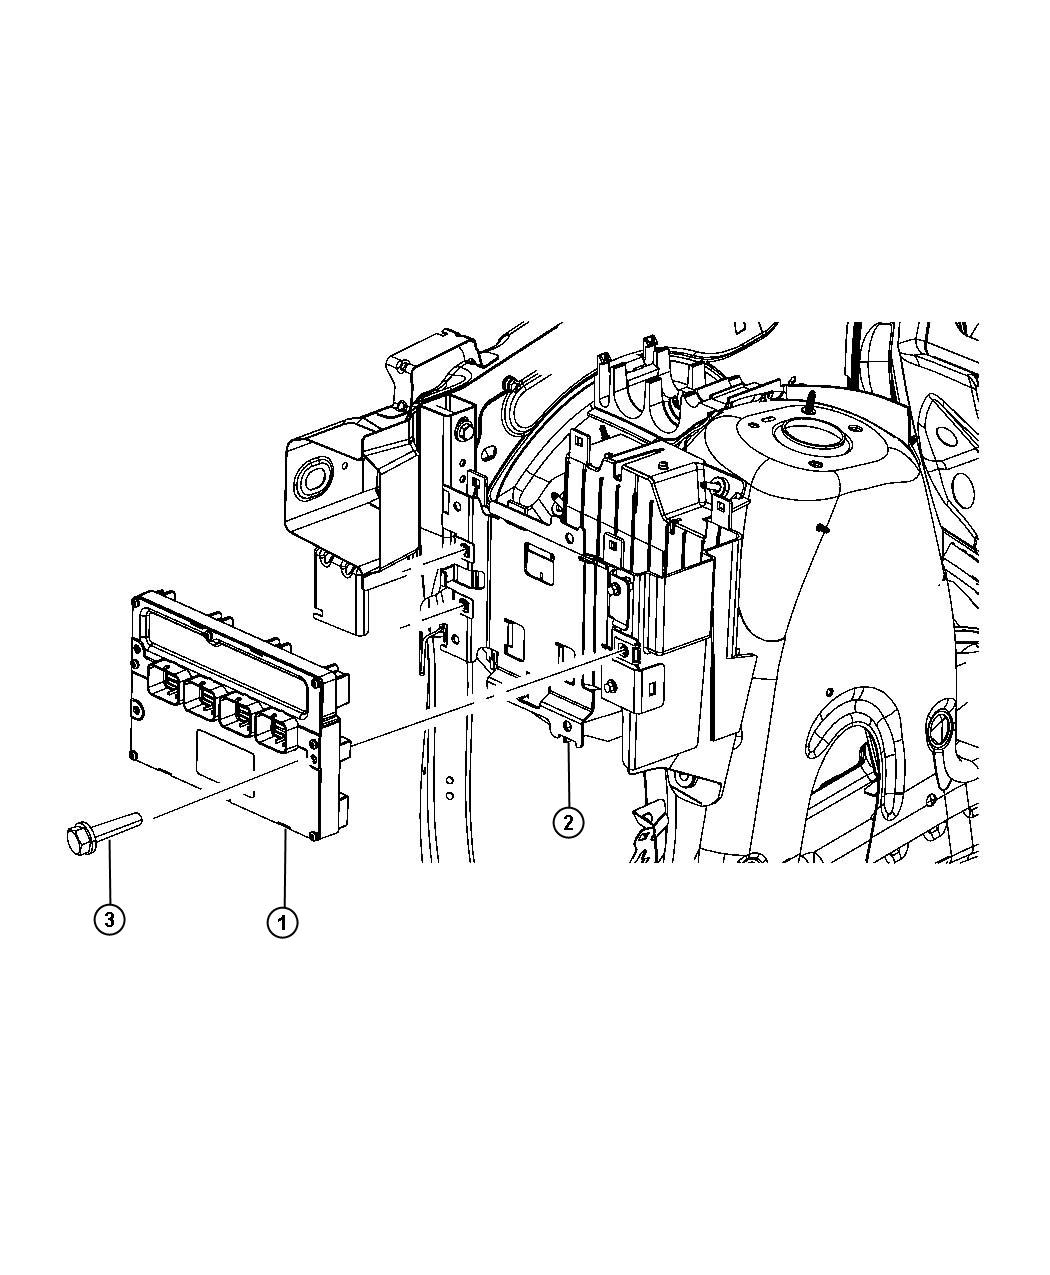 2011 Dodge Module. Powertrain control. Generic. Engine